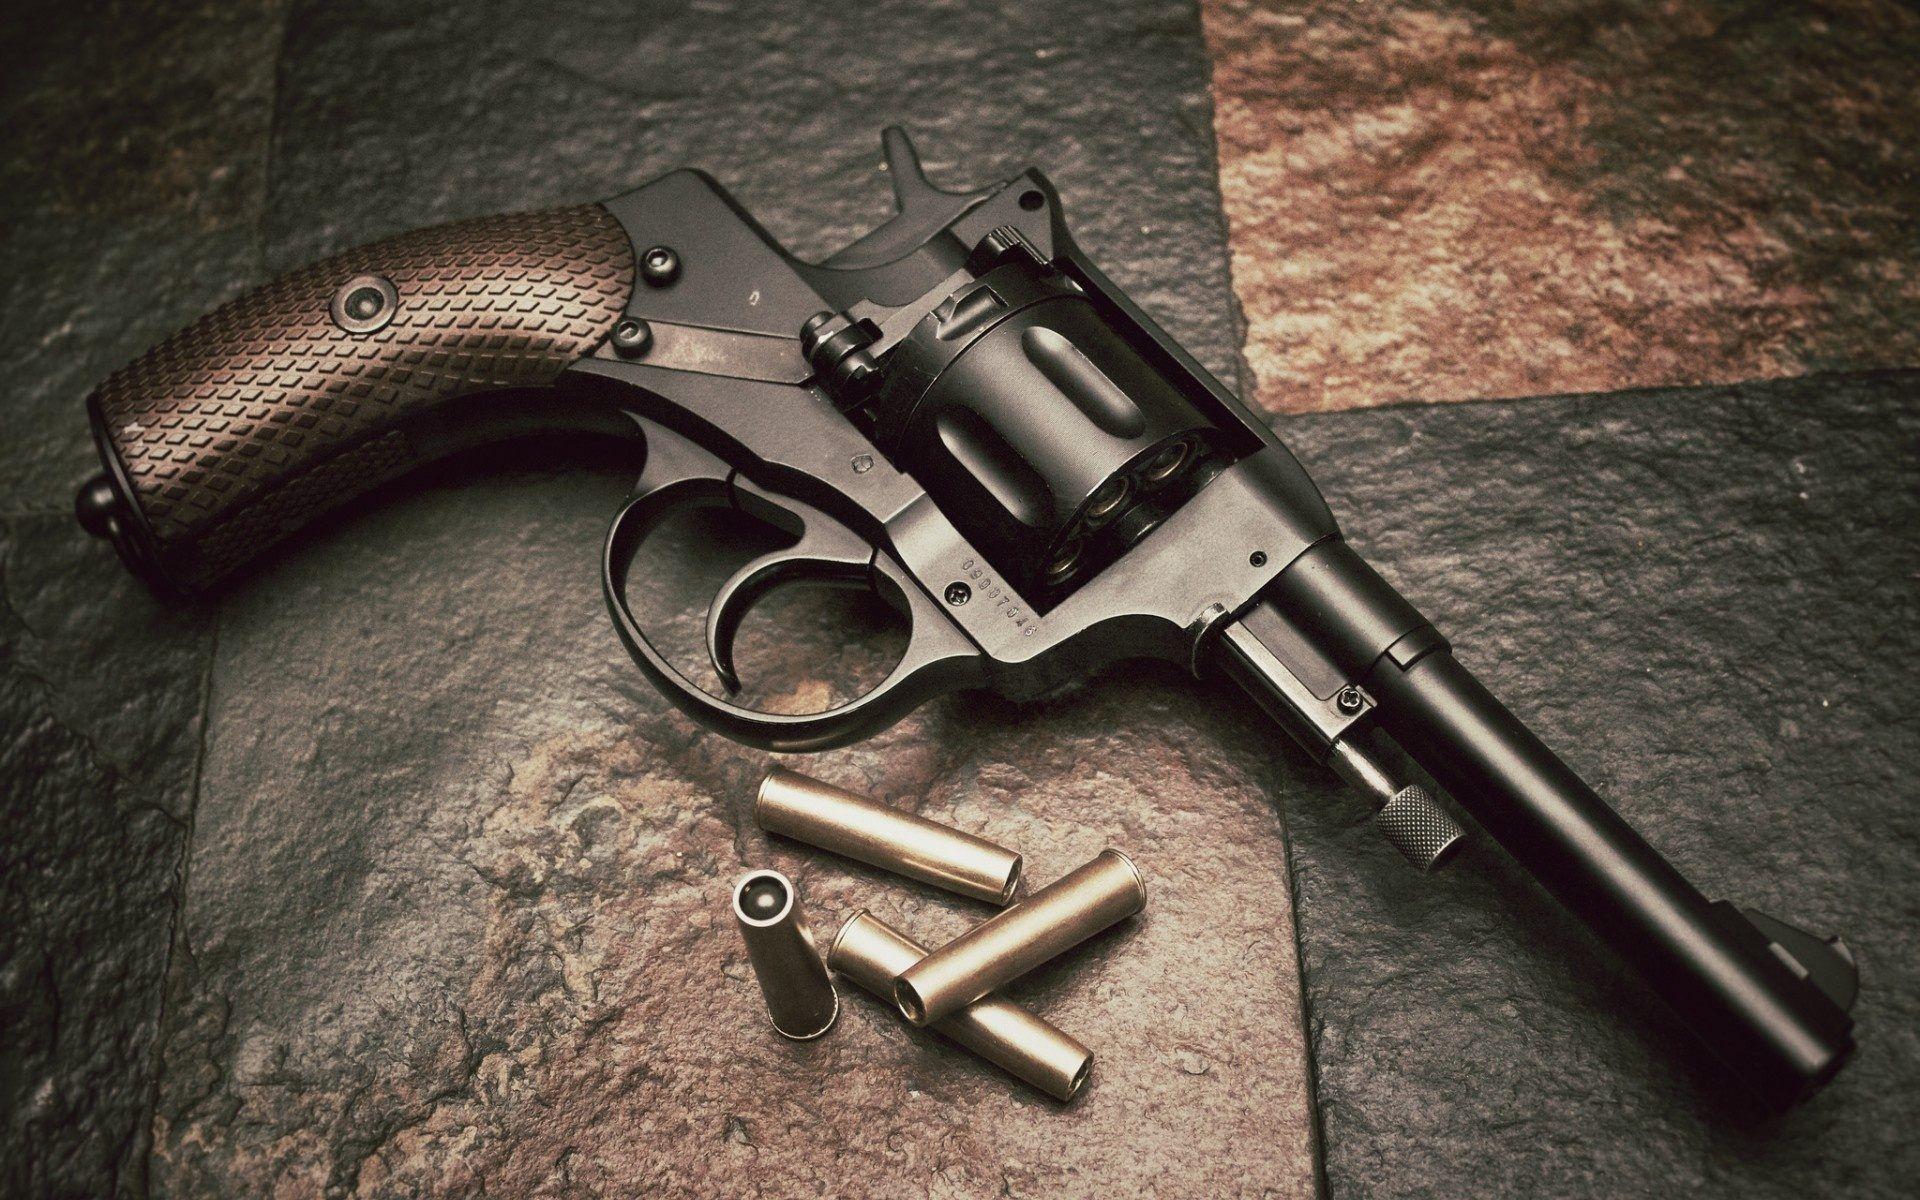 Wallpaper download gun - Full Hd P Gun Wallpapers Hd Desktop Backgrounds X